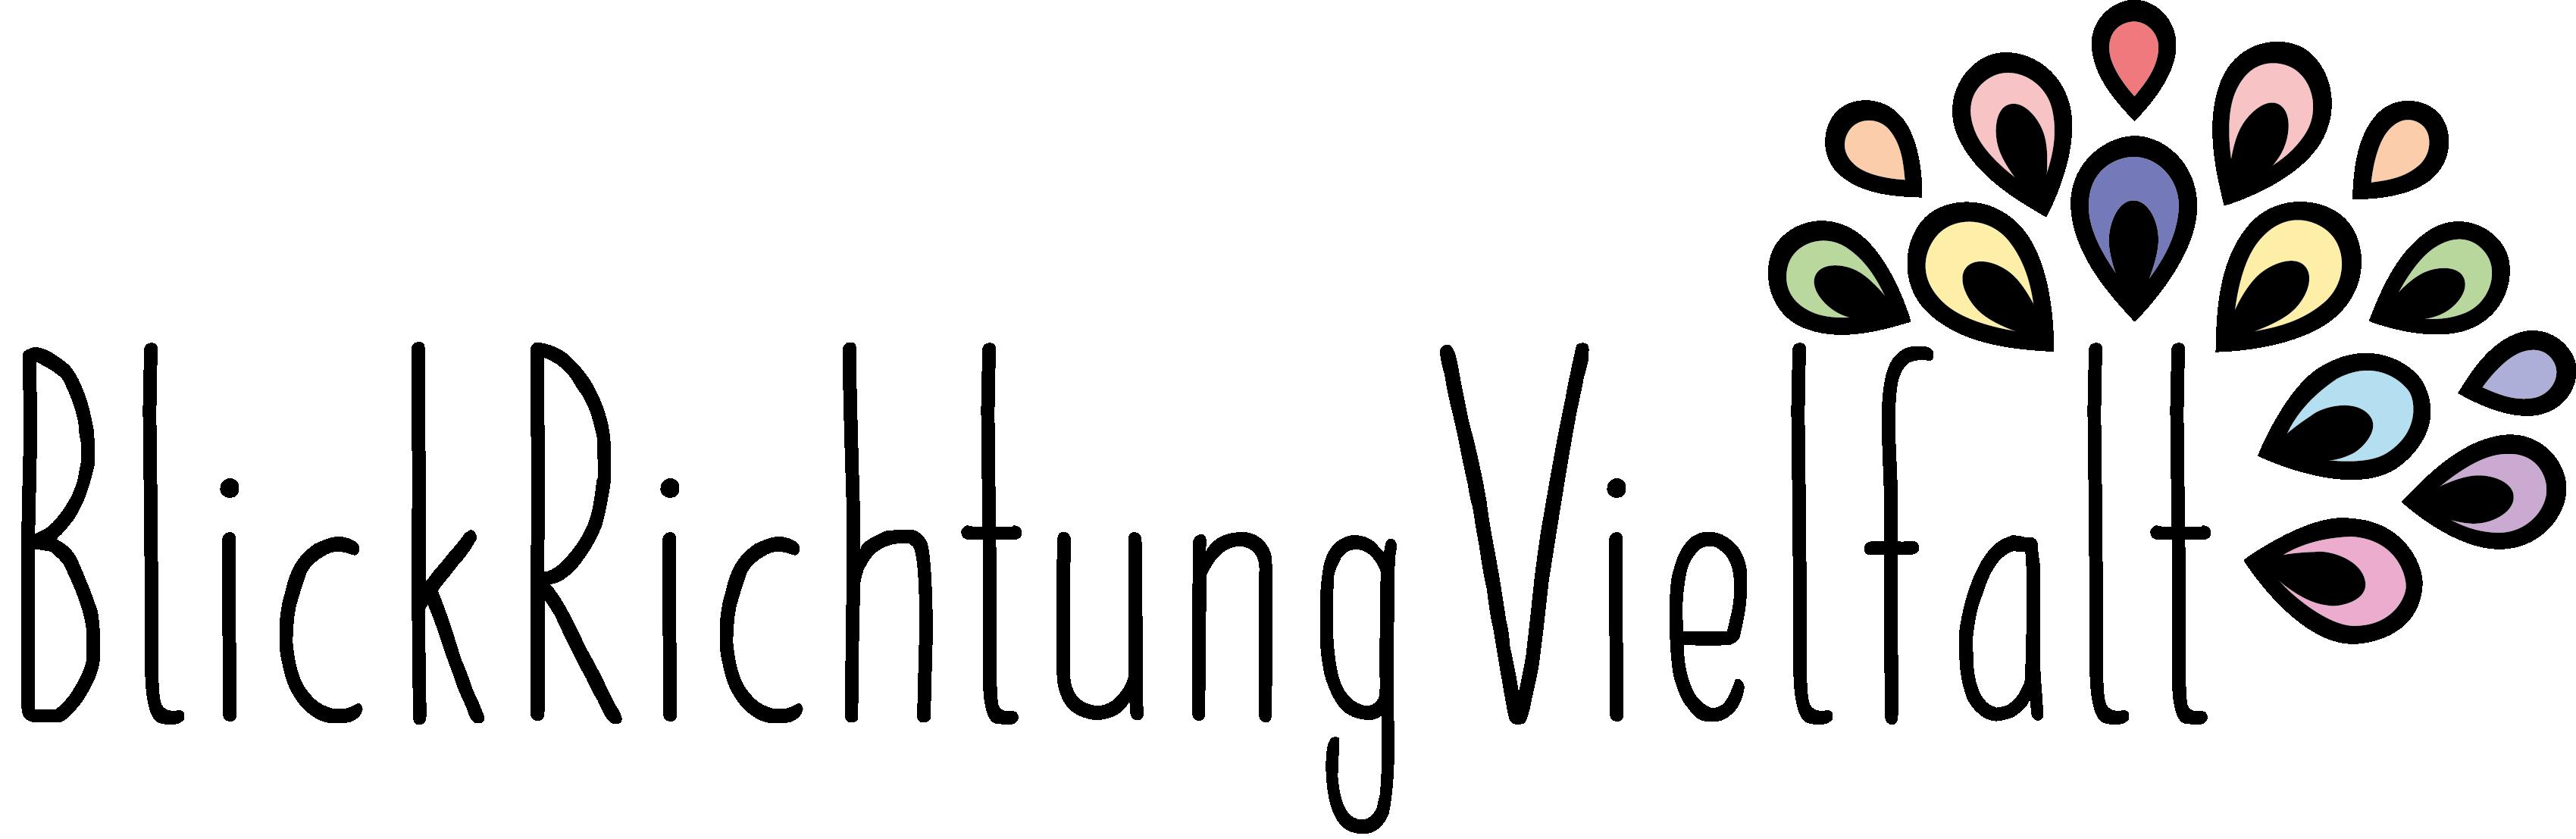 https://blick-richtung-vielfalt.de/wp-content/uploads/2018/05/BRV-Logo-vektorisiert.png